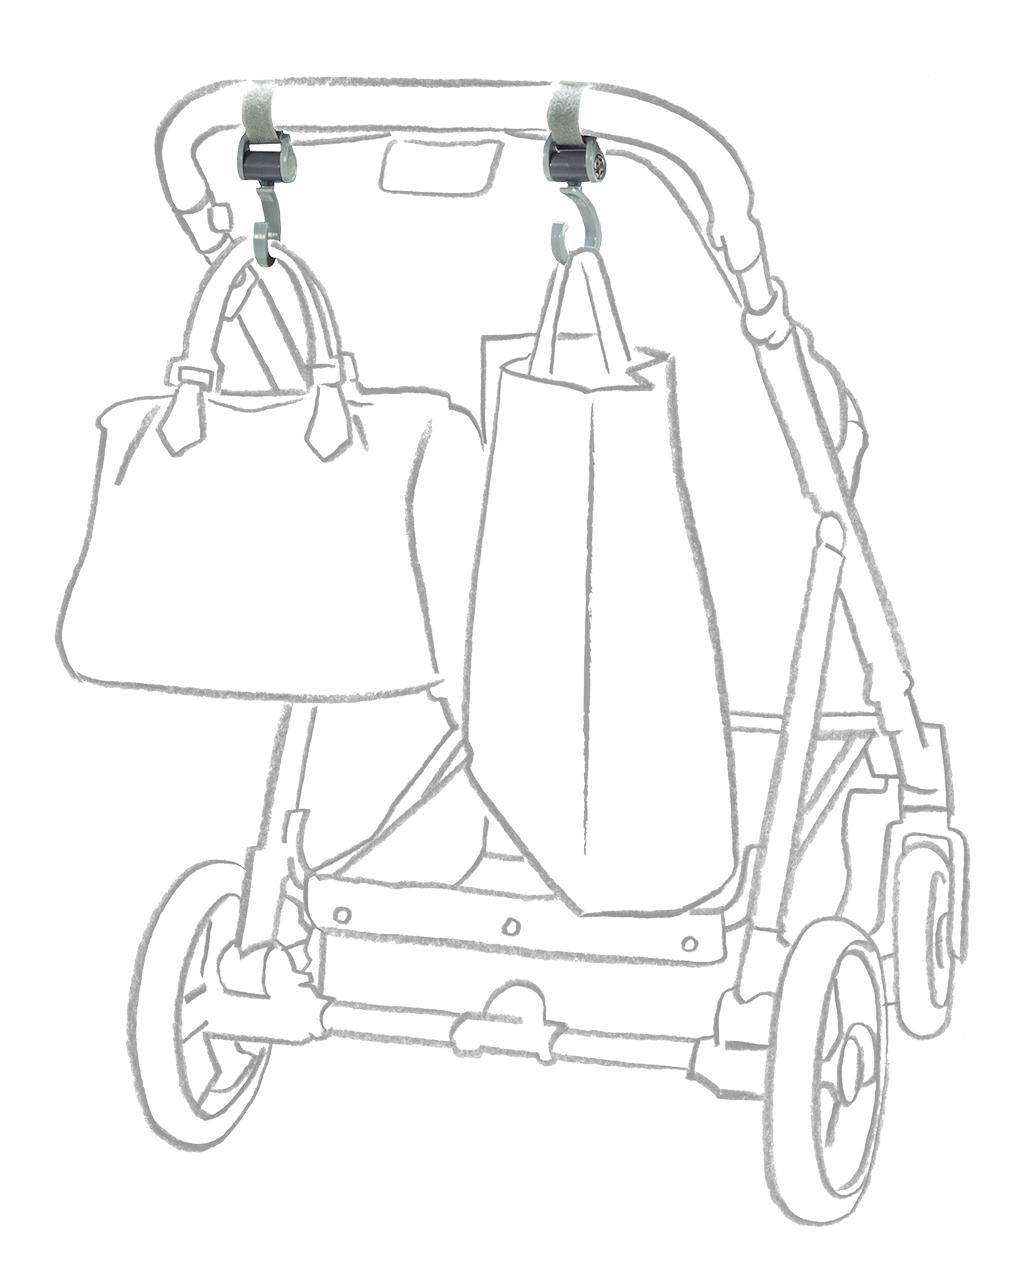 Gancio porta borse - Giordani